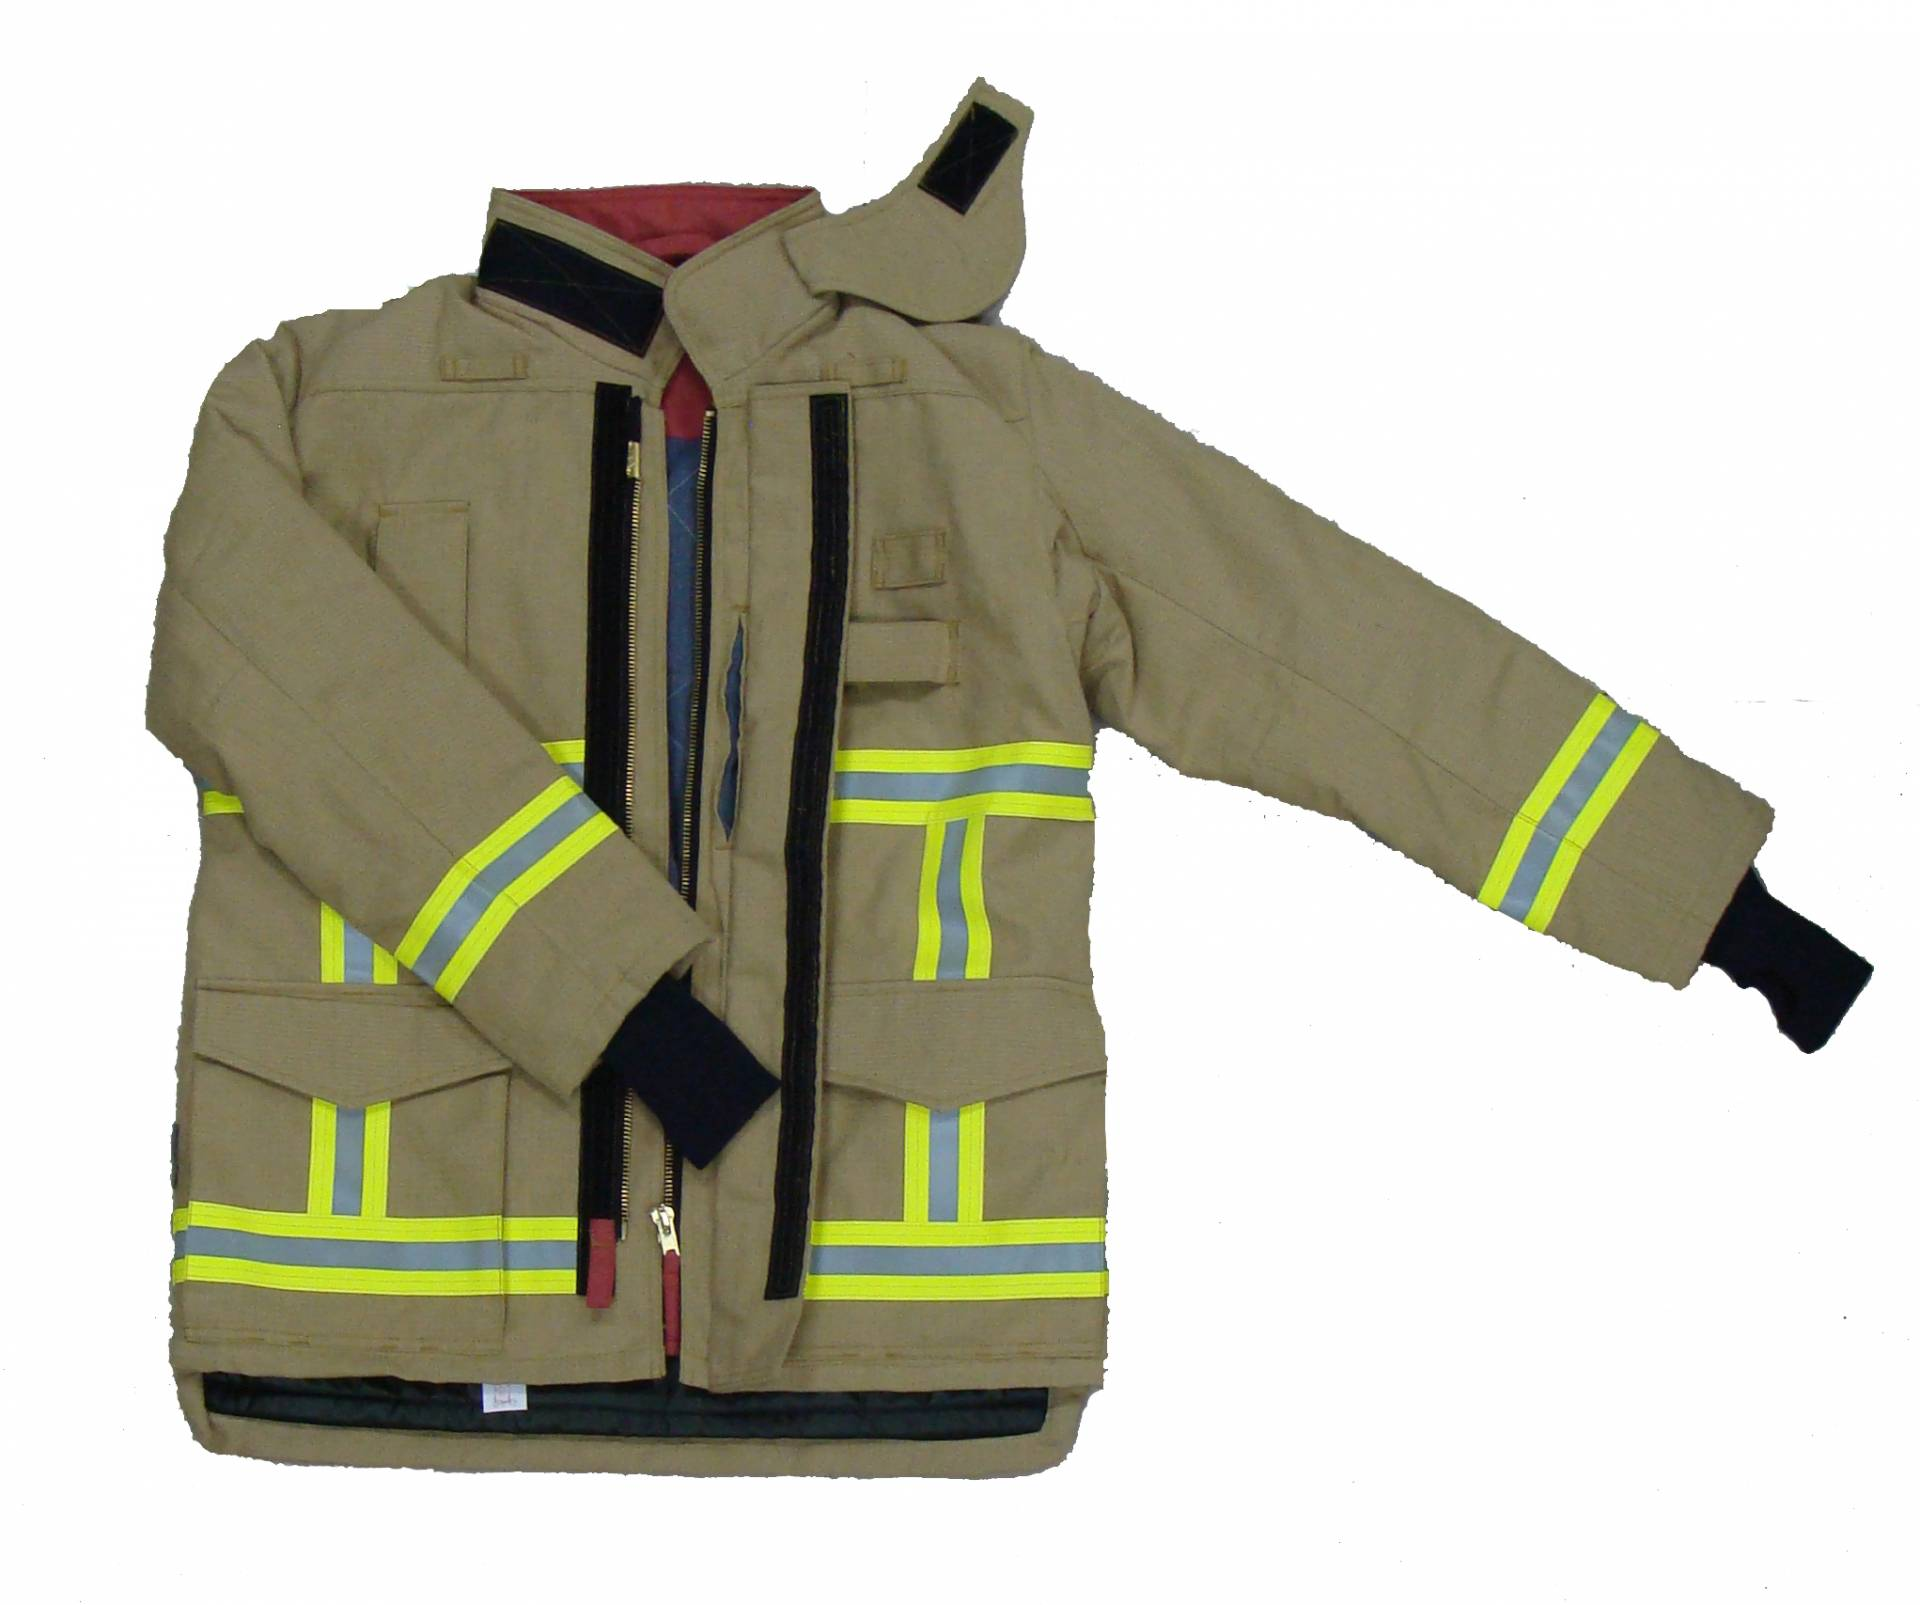 Premium 701-G European style Firefighting Suit, EN469 Level 2, CE certificate, heavy duty to protect firemen